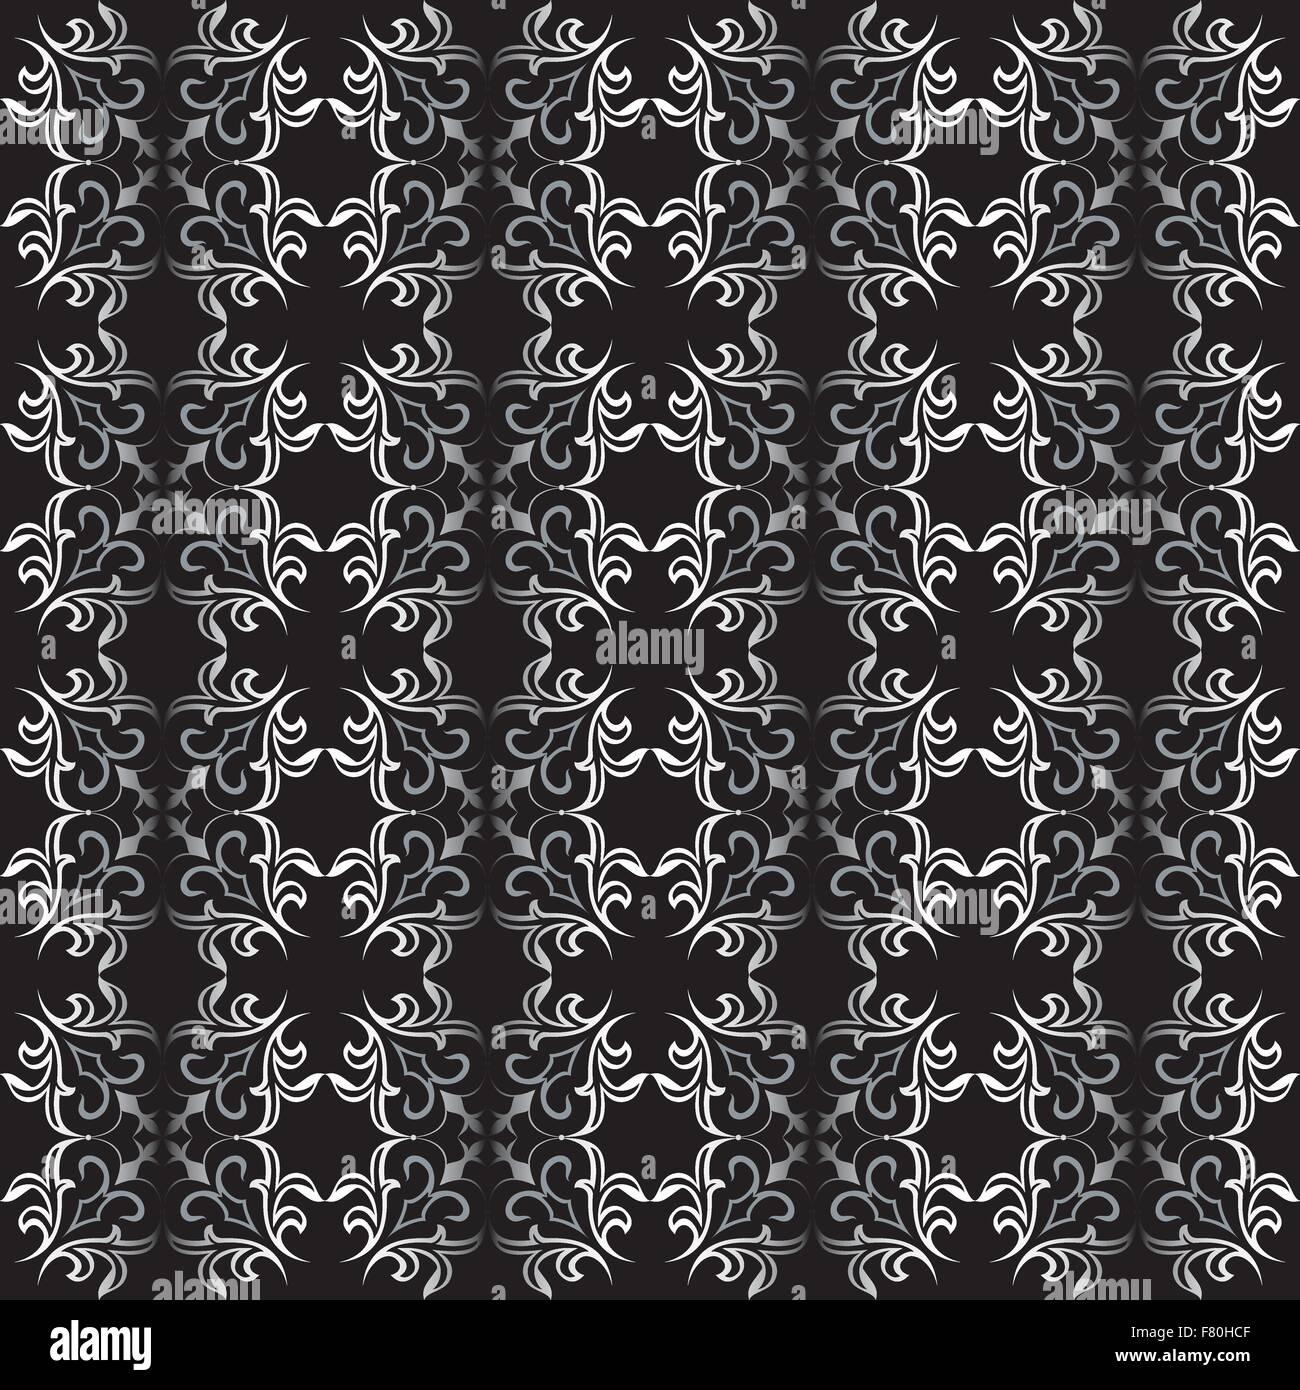 Ornate black and white seamless wallpaper pattern - Stock Image